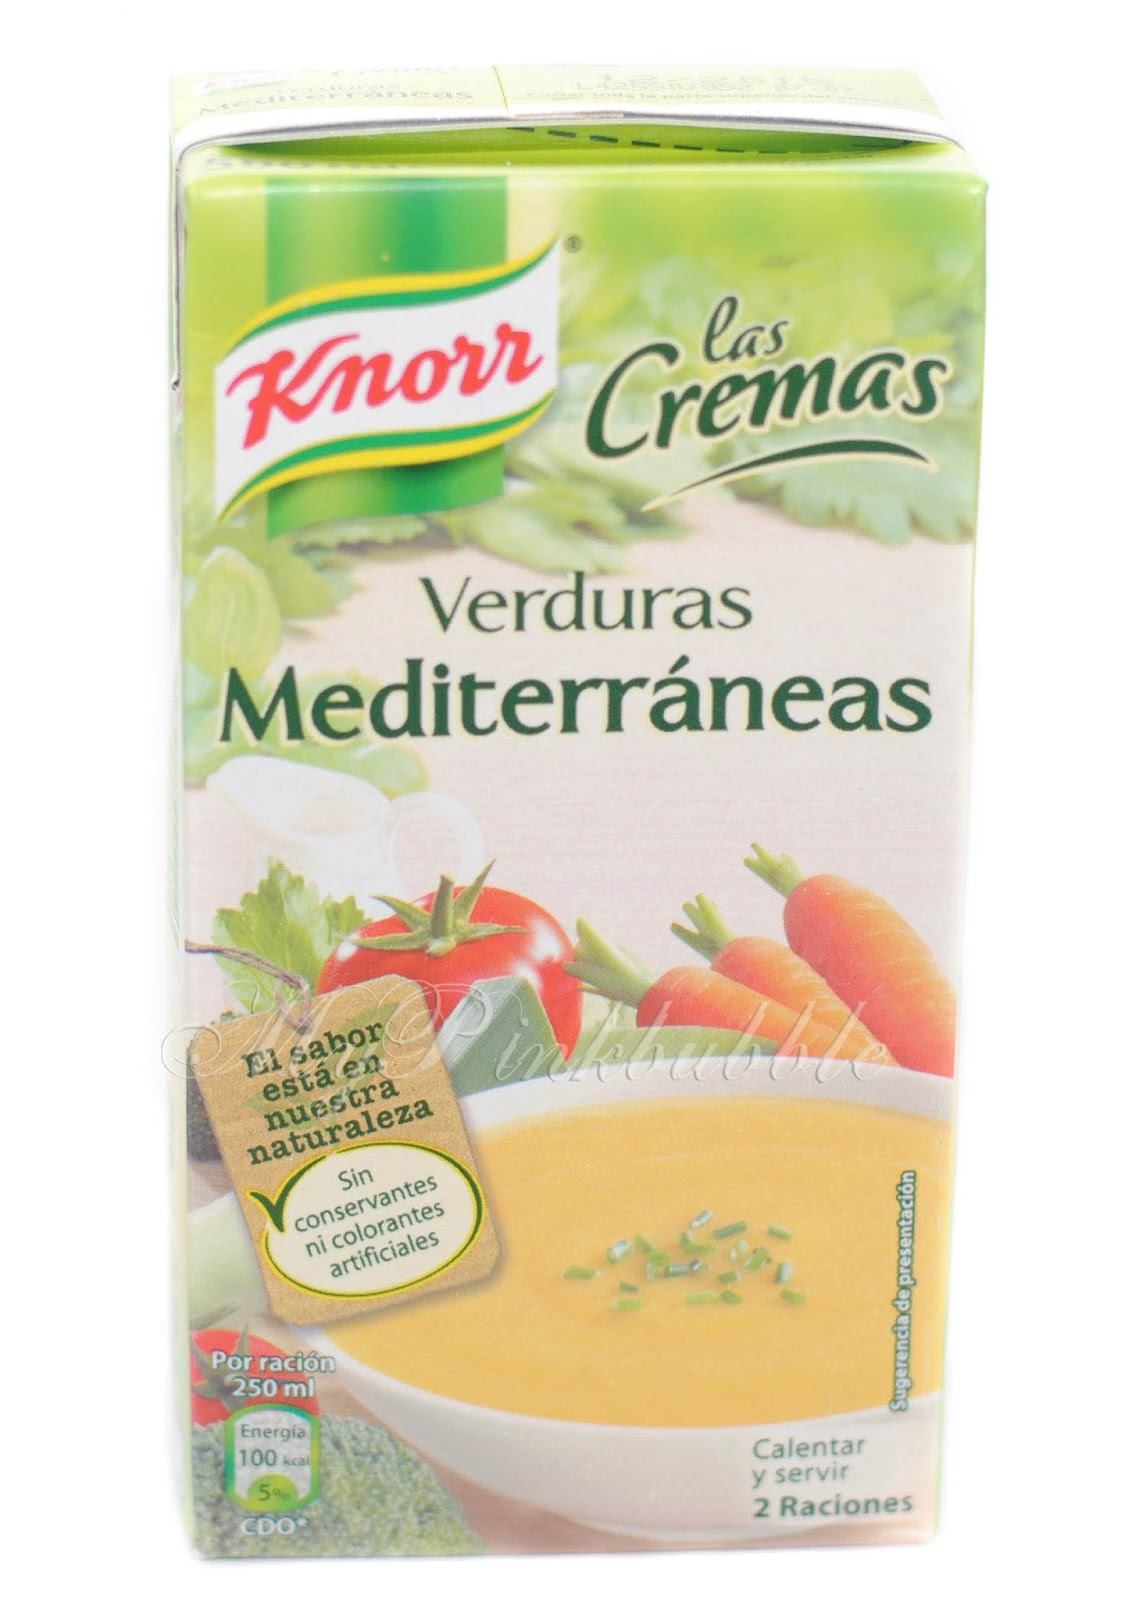 Knorr crema de verduras mediterranea